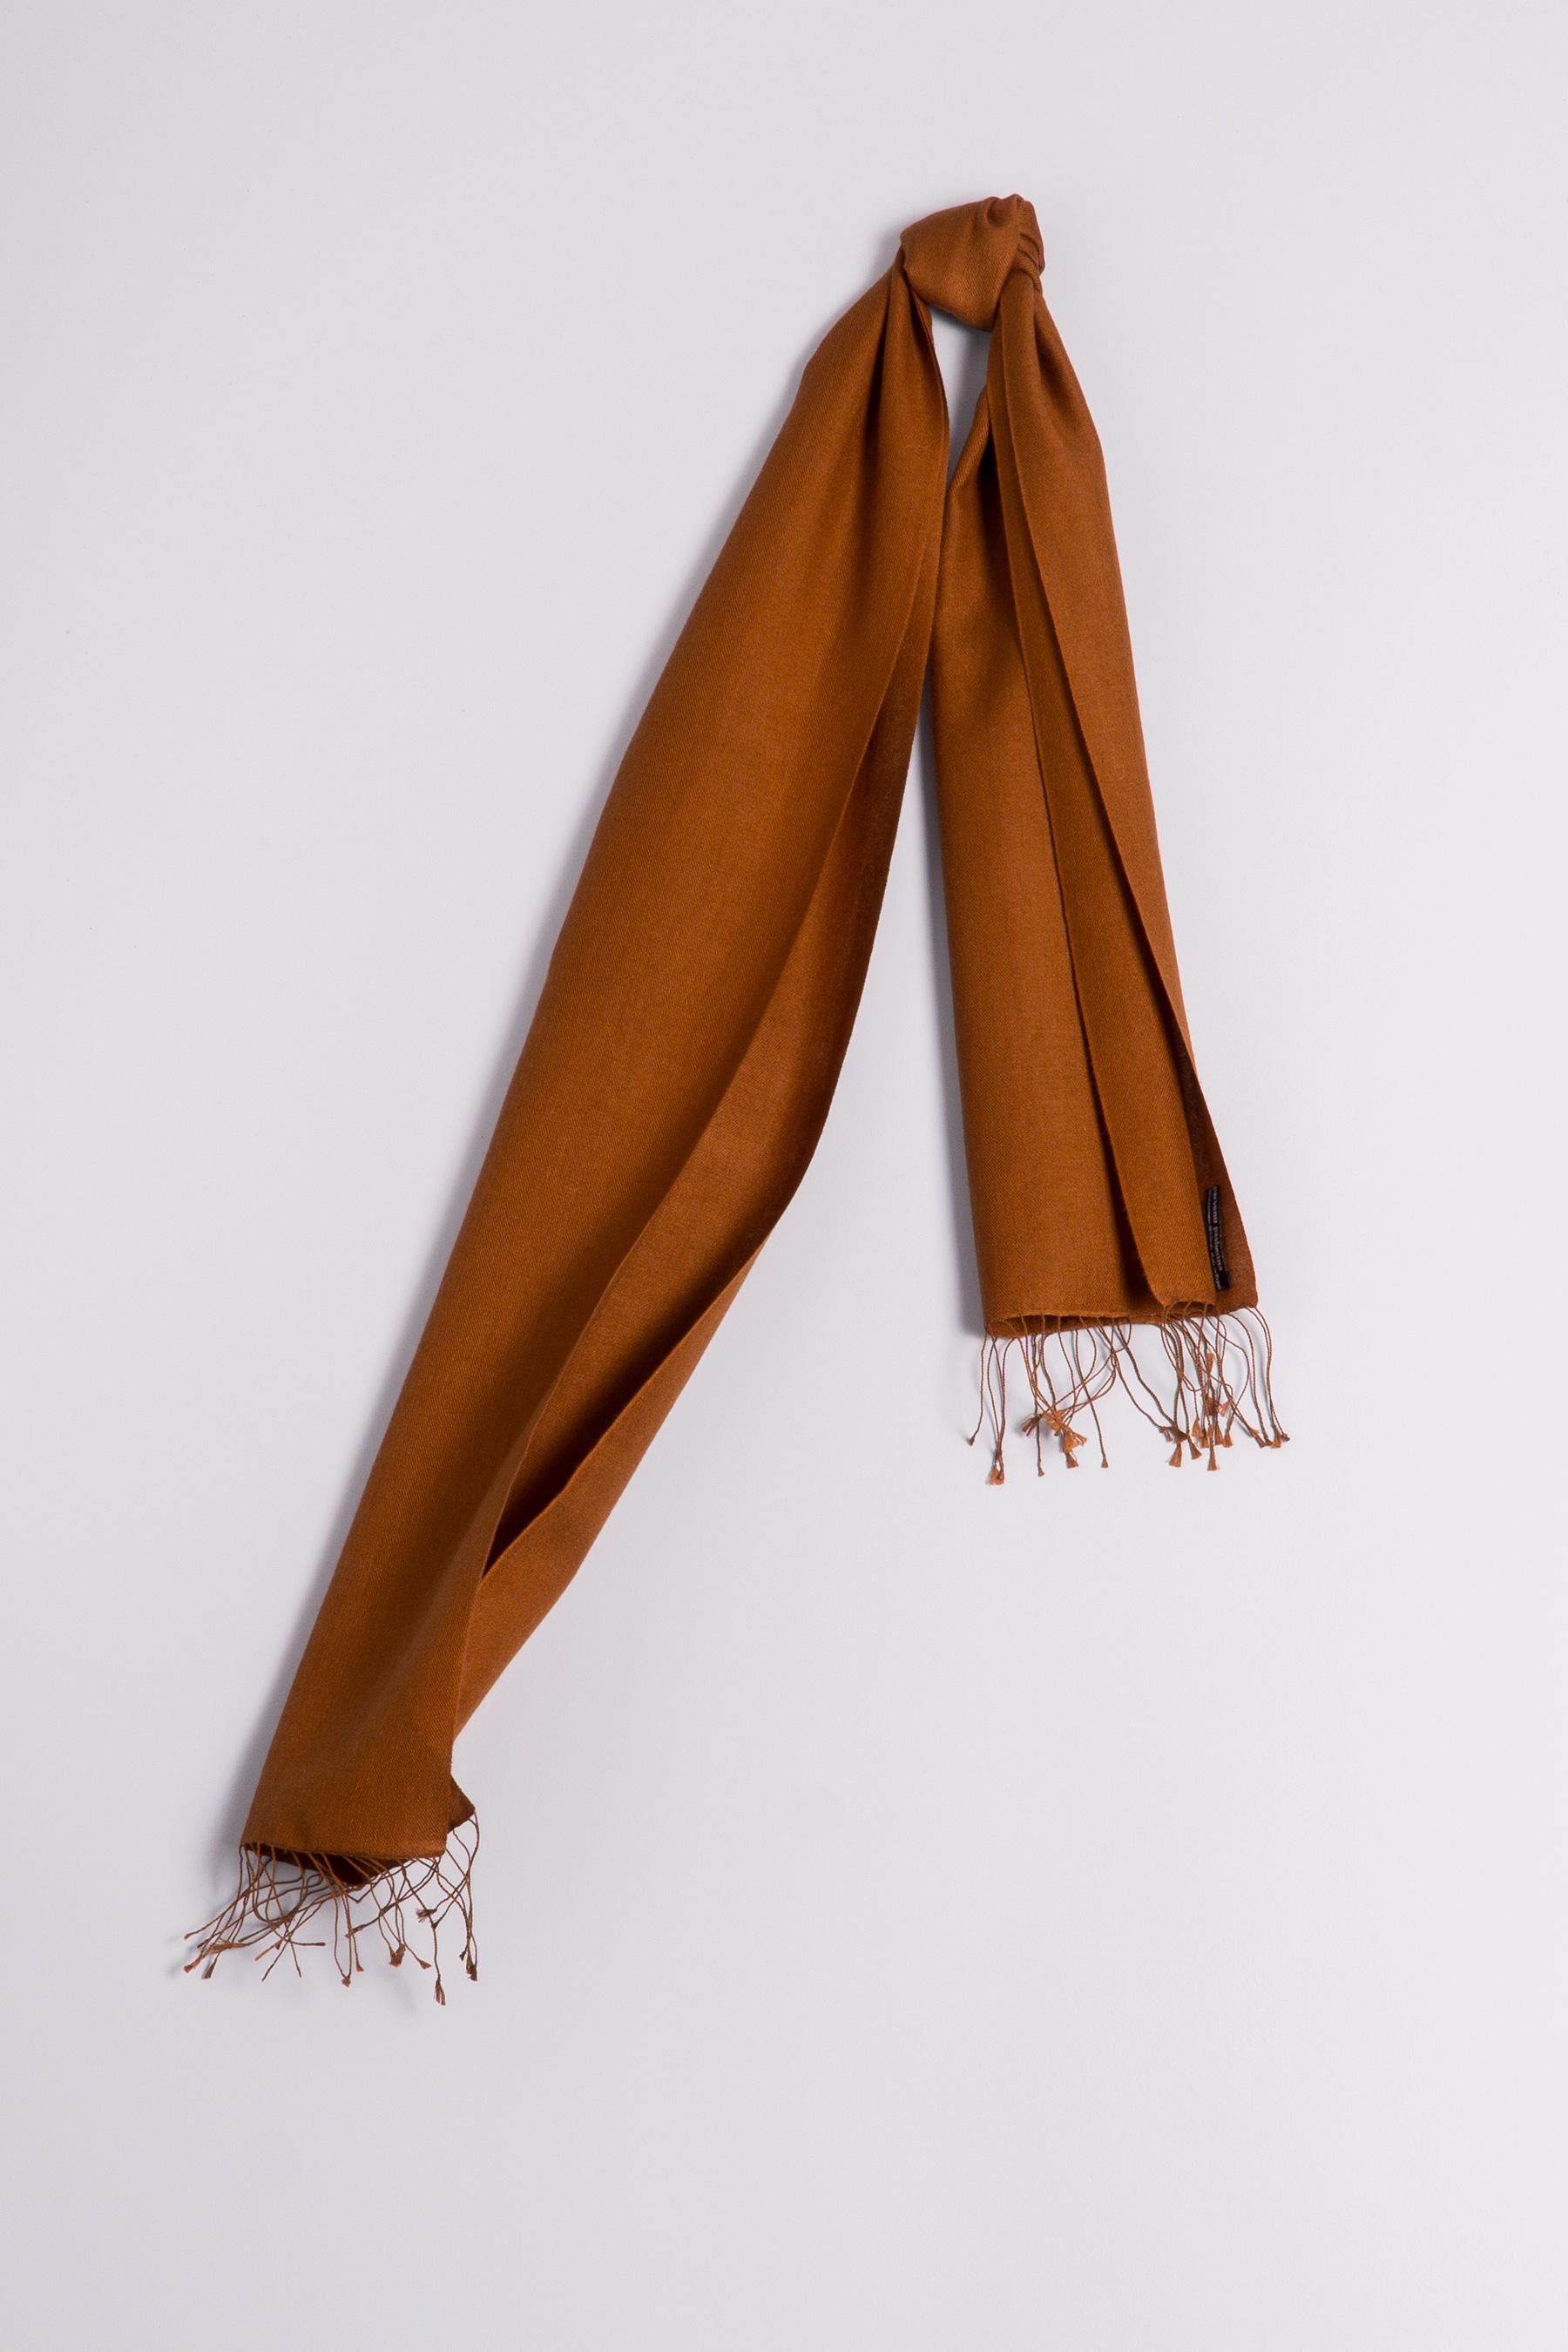 d5fa584b8001a3 Pashmina 30x150cm bronze brown | Pashmina 70% Cashmere Shawl | Pashmina |  Pashmina.de